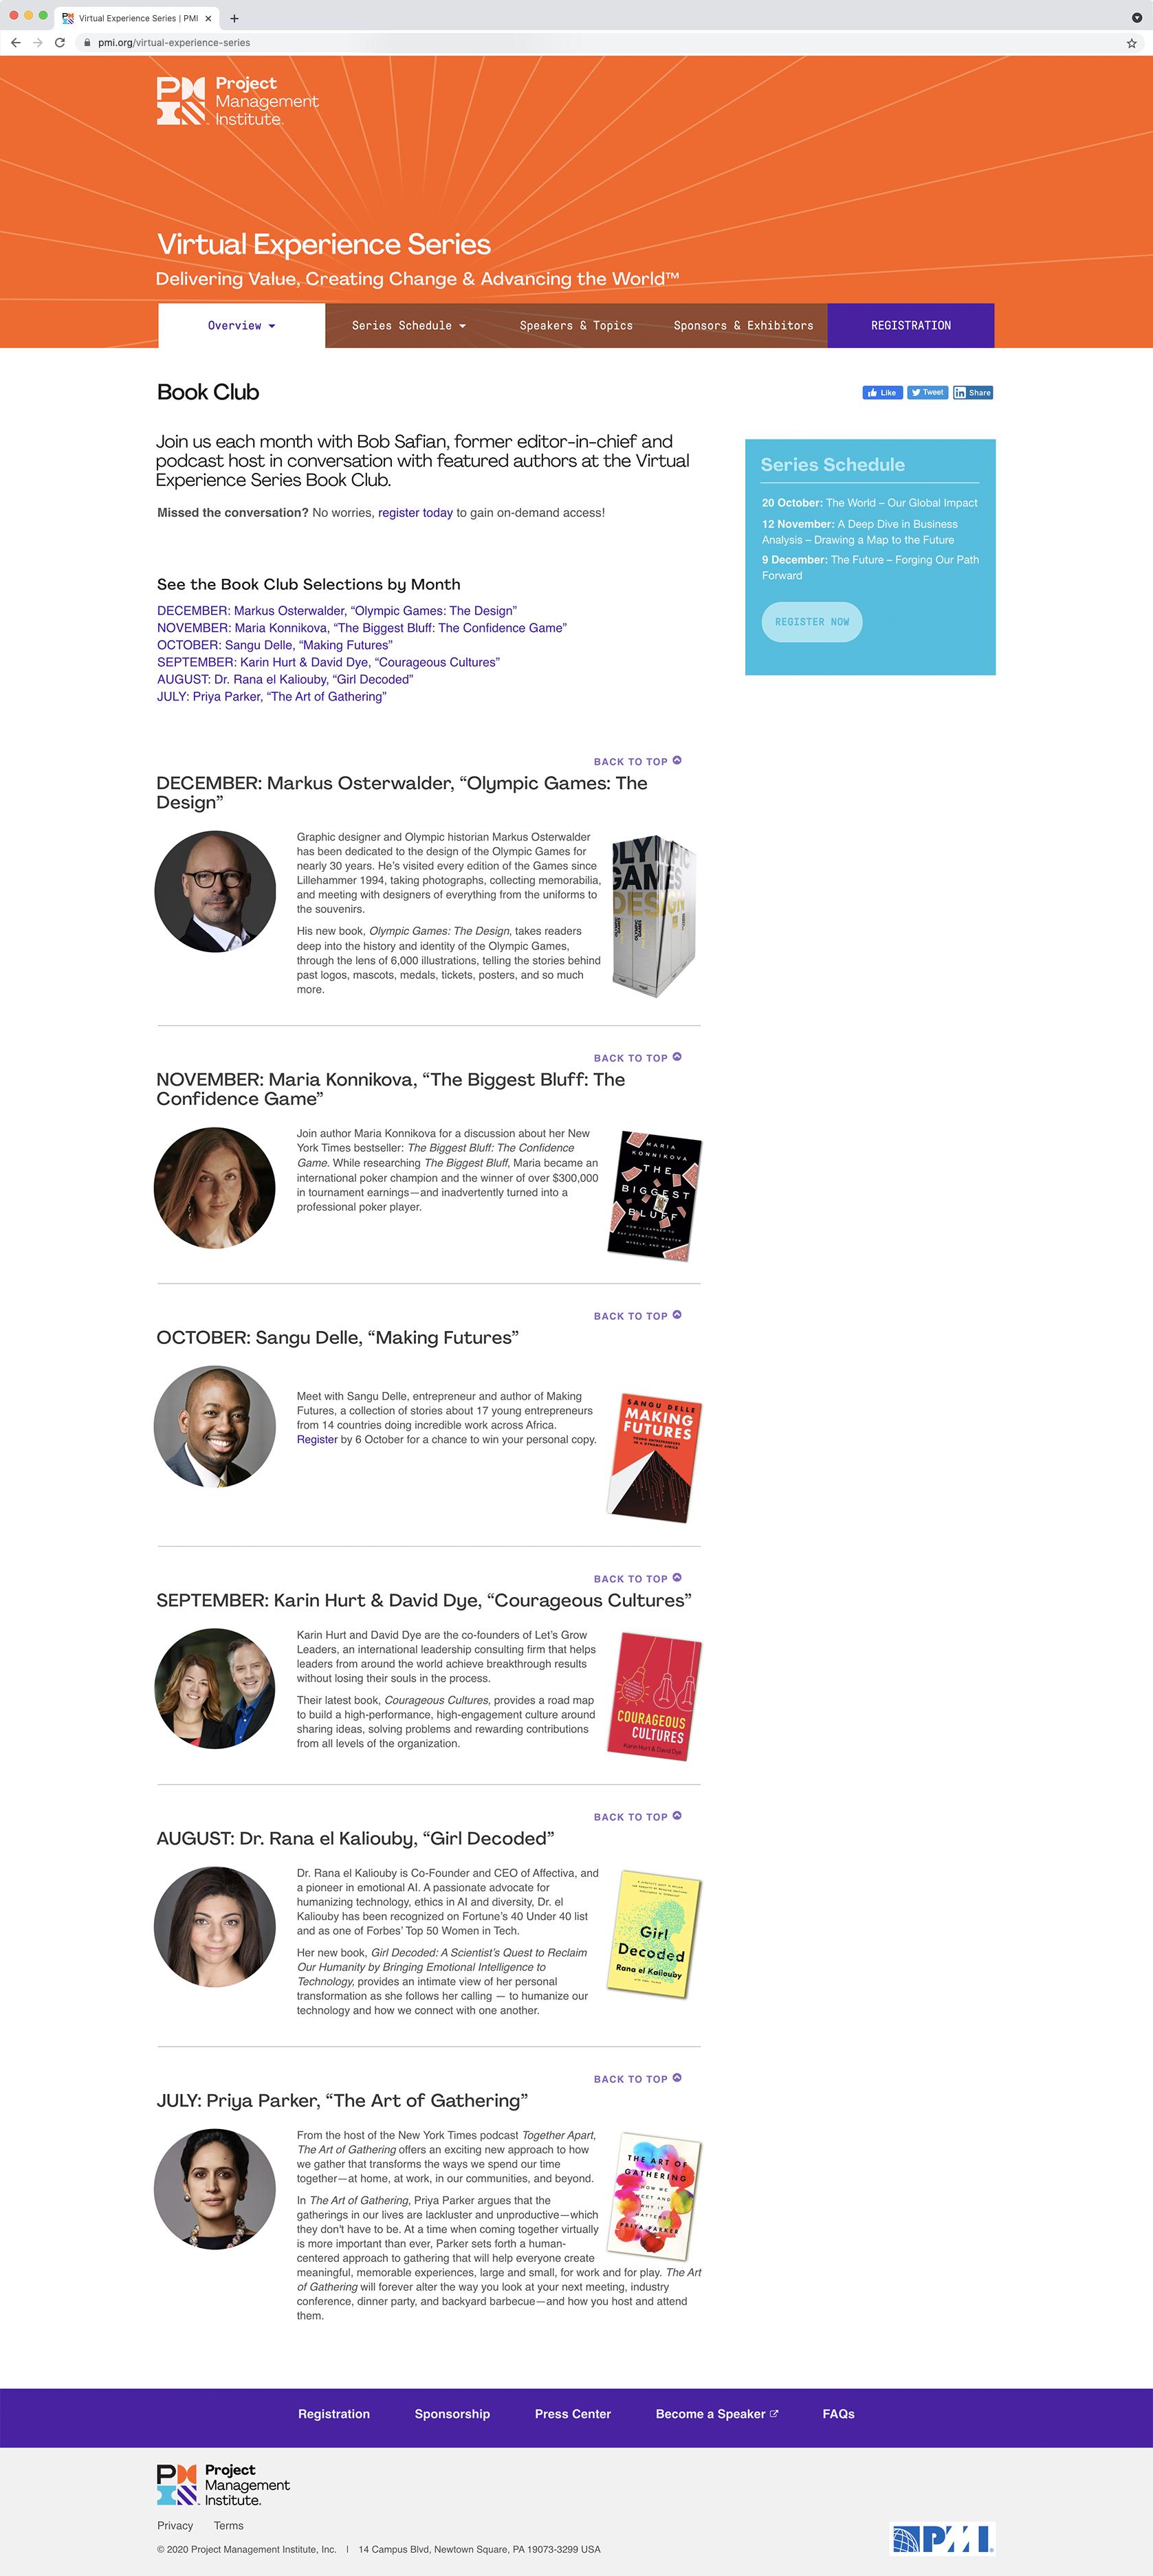 PMI Virtual Experience Series Book Club